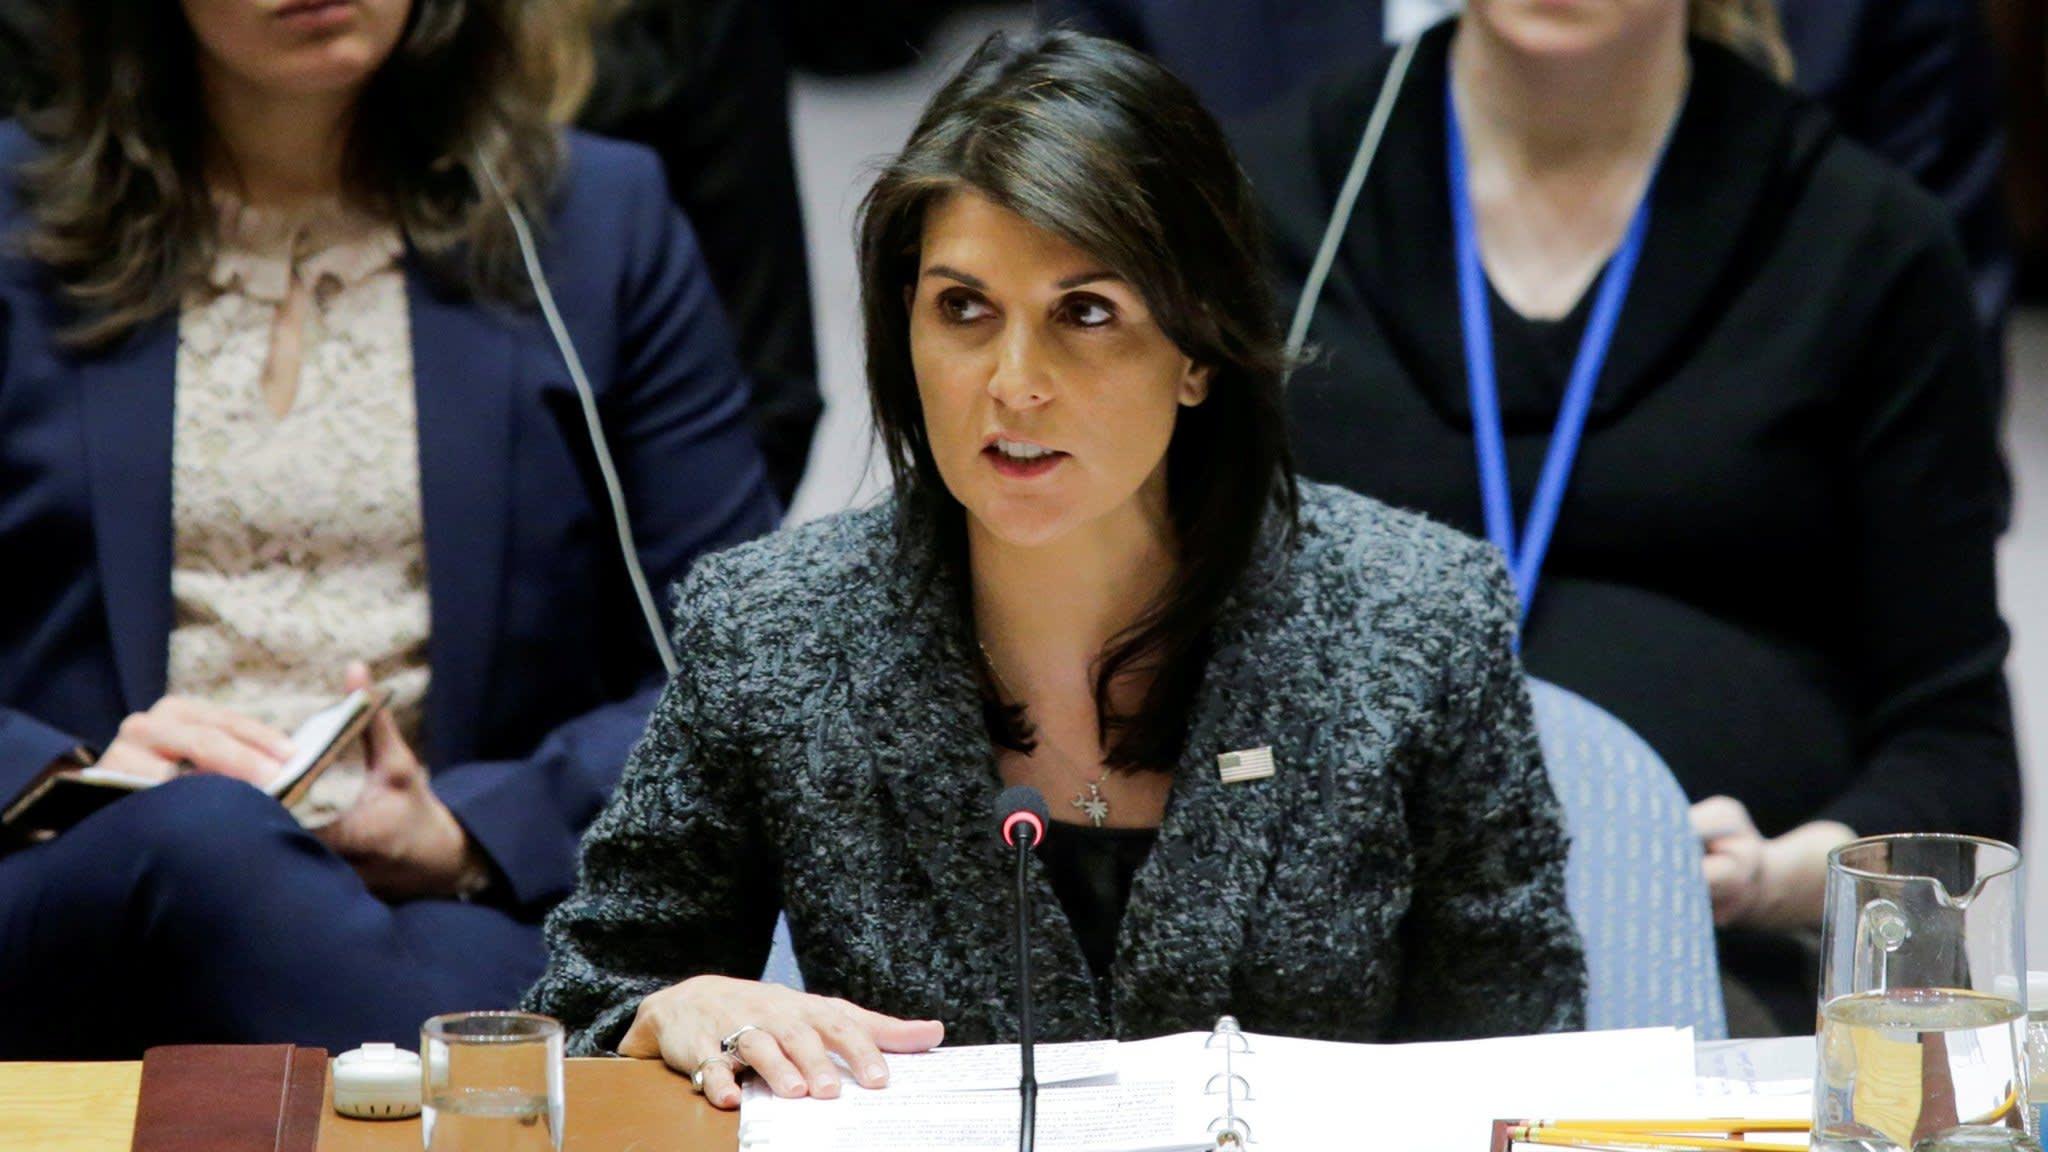 Nikki Haley resigns as US ambassador to UN